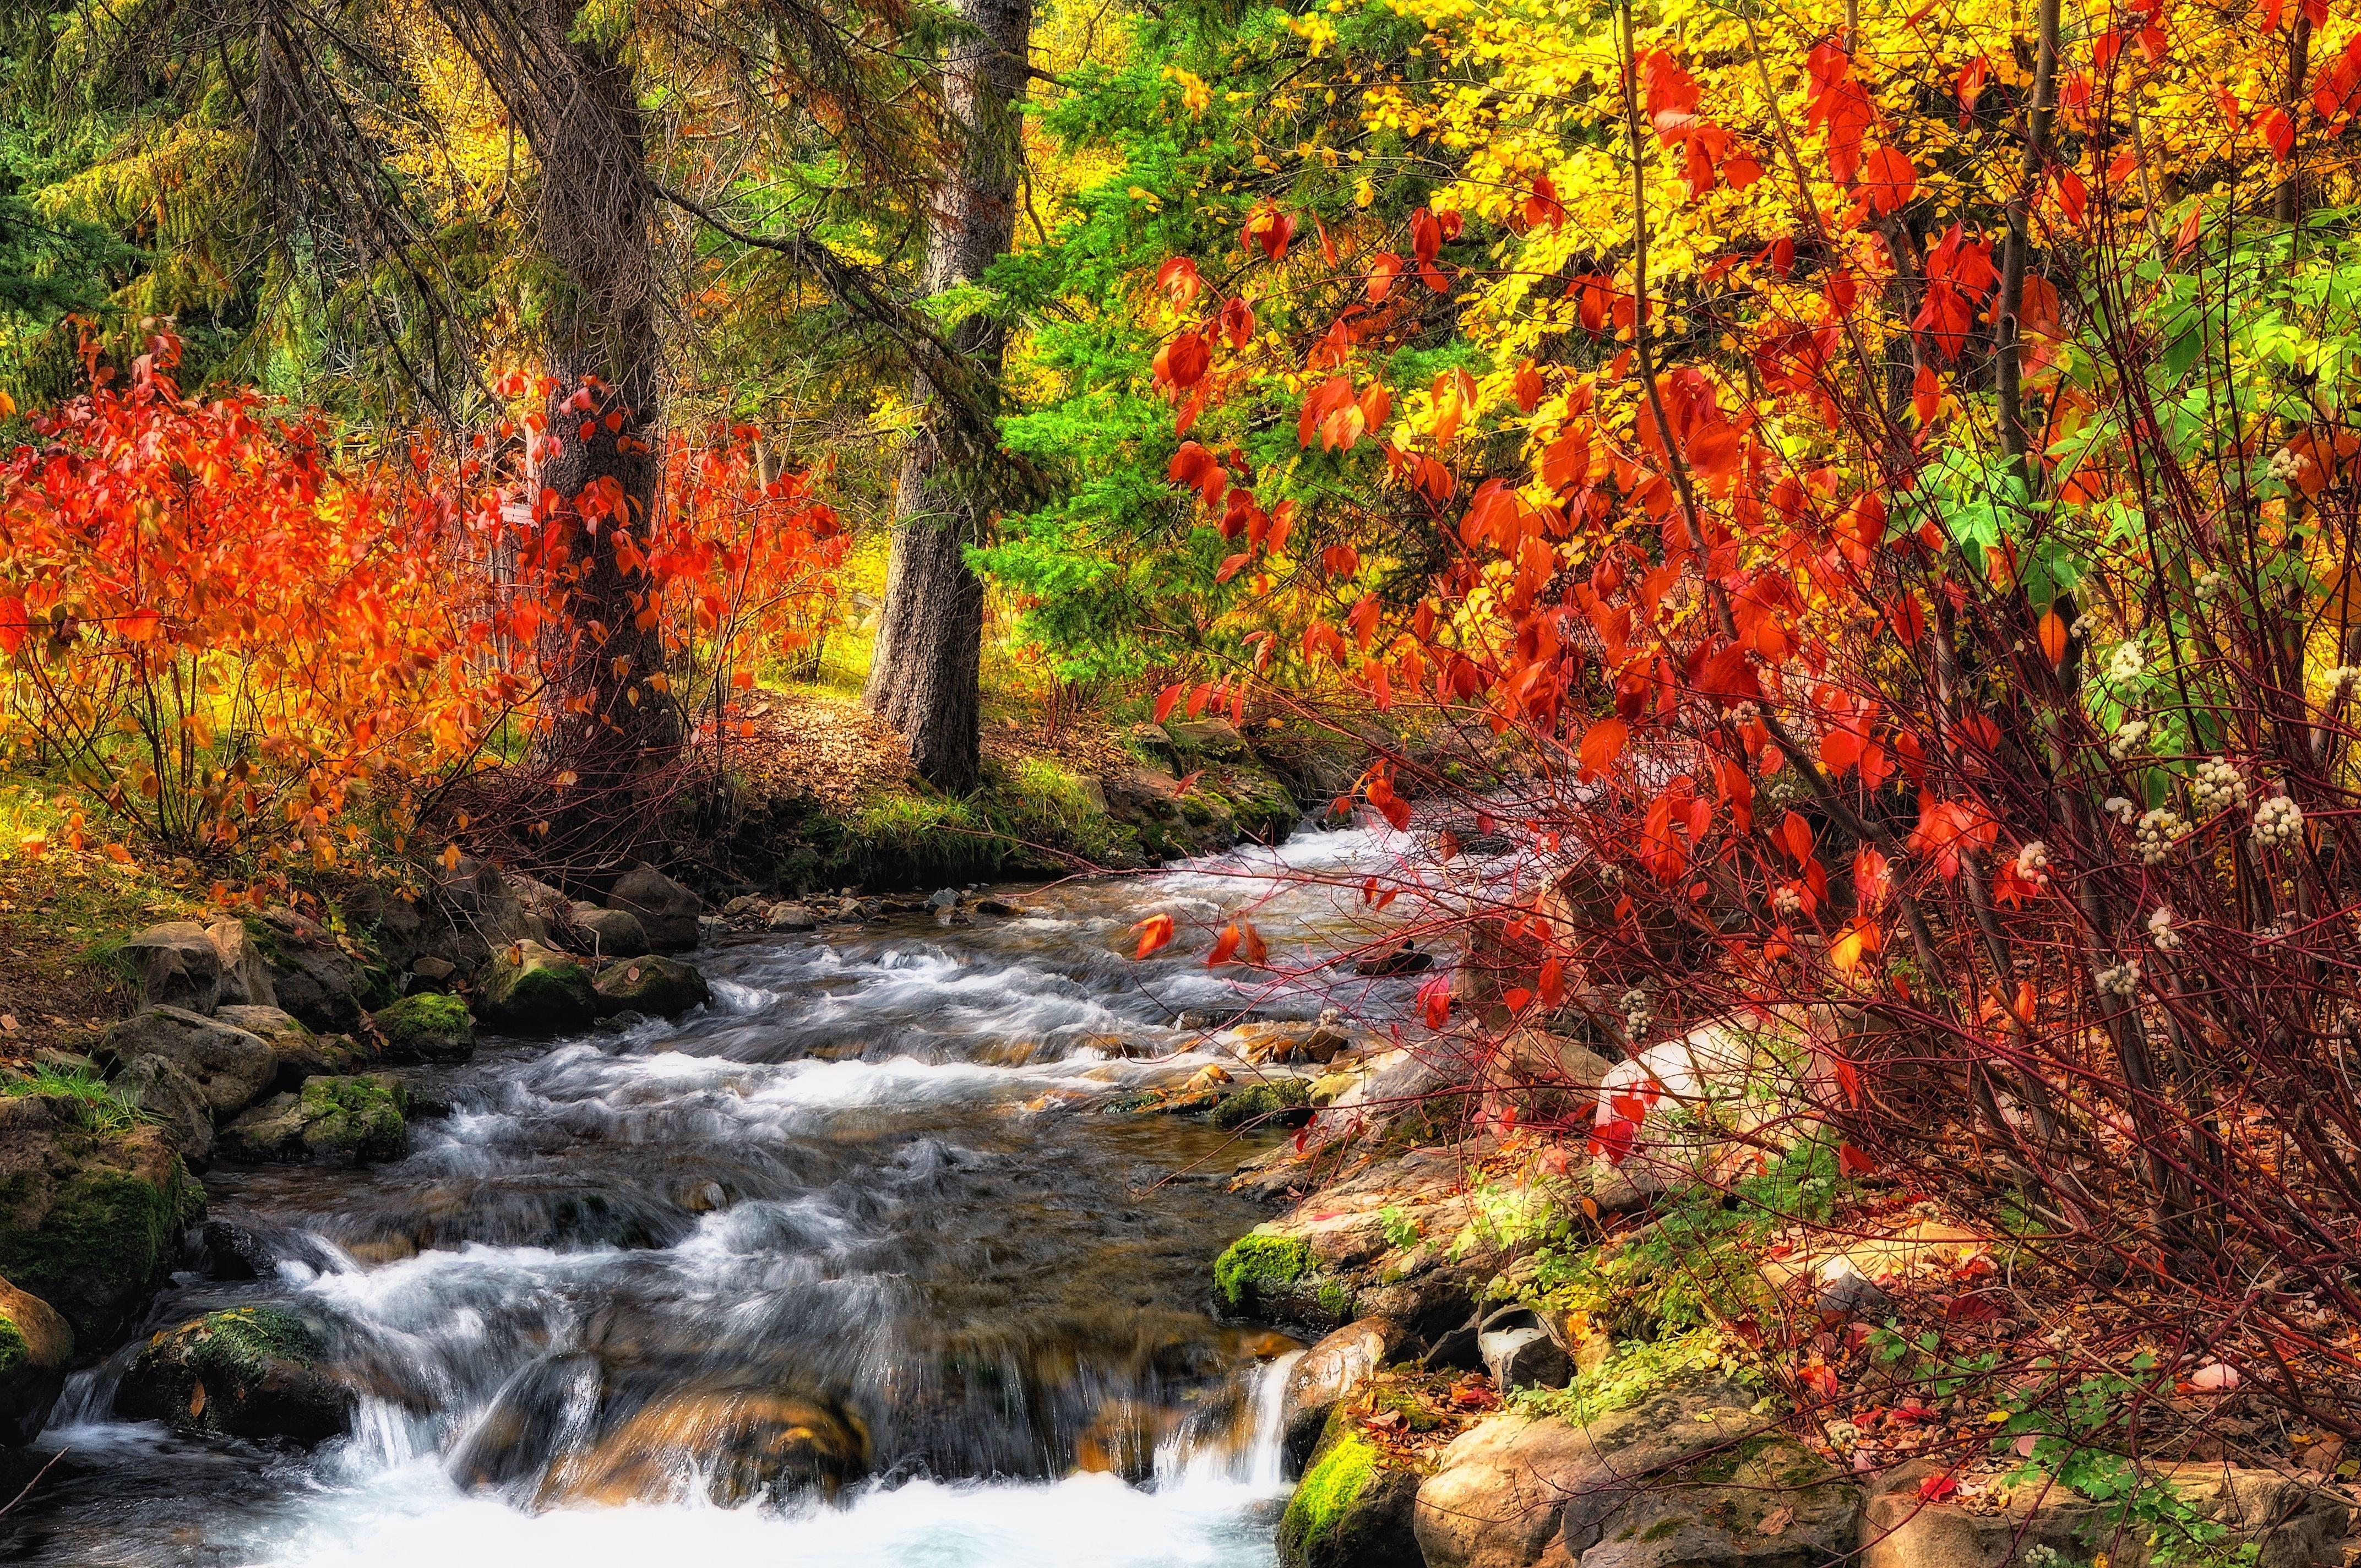 autumn nature river - photo #16